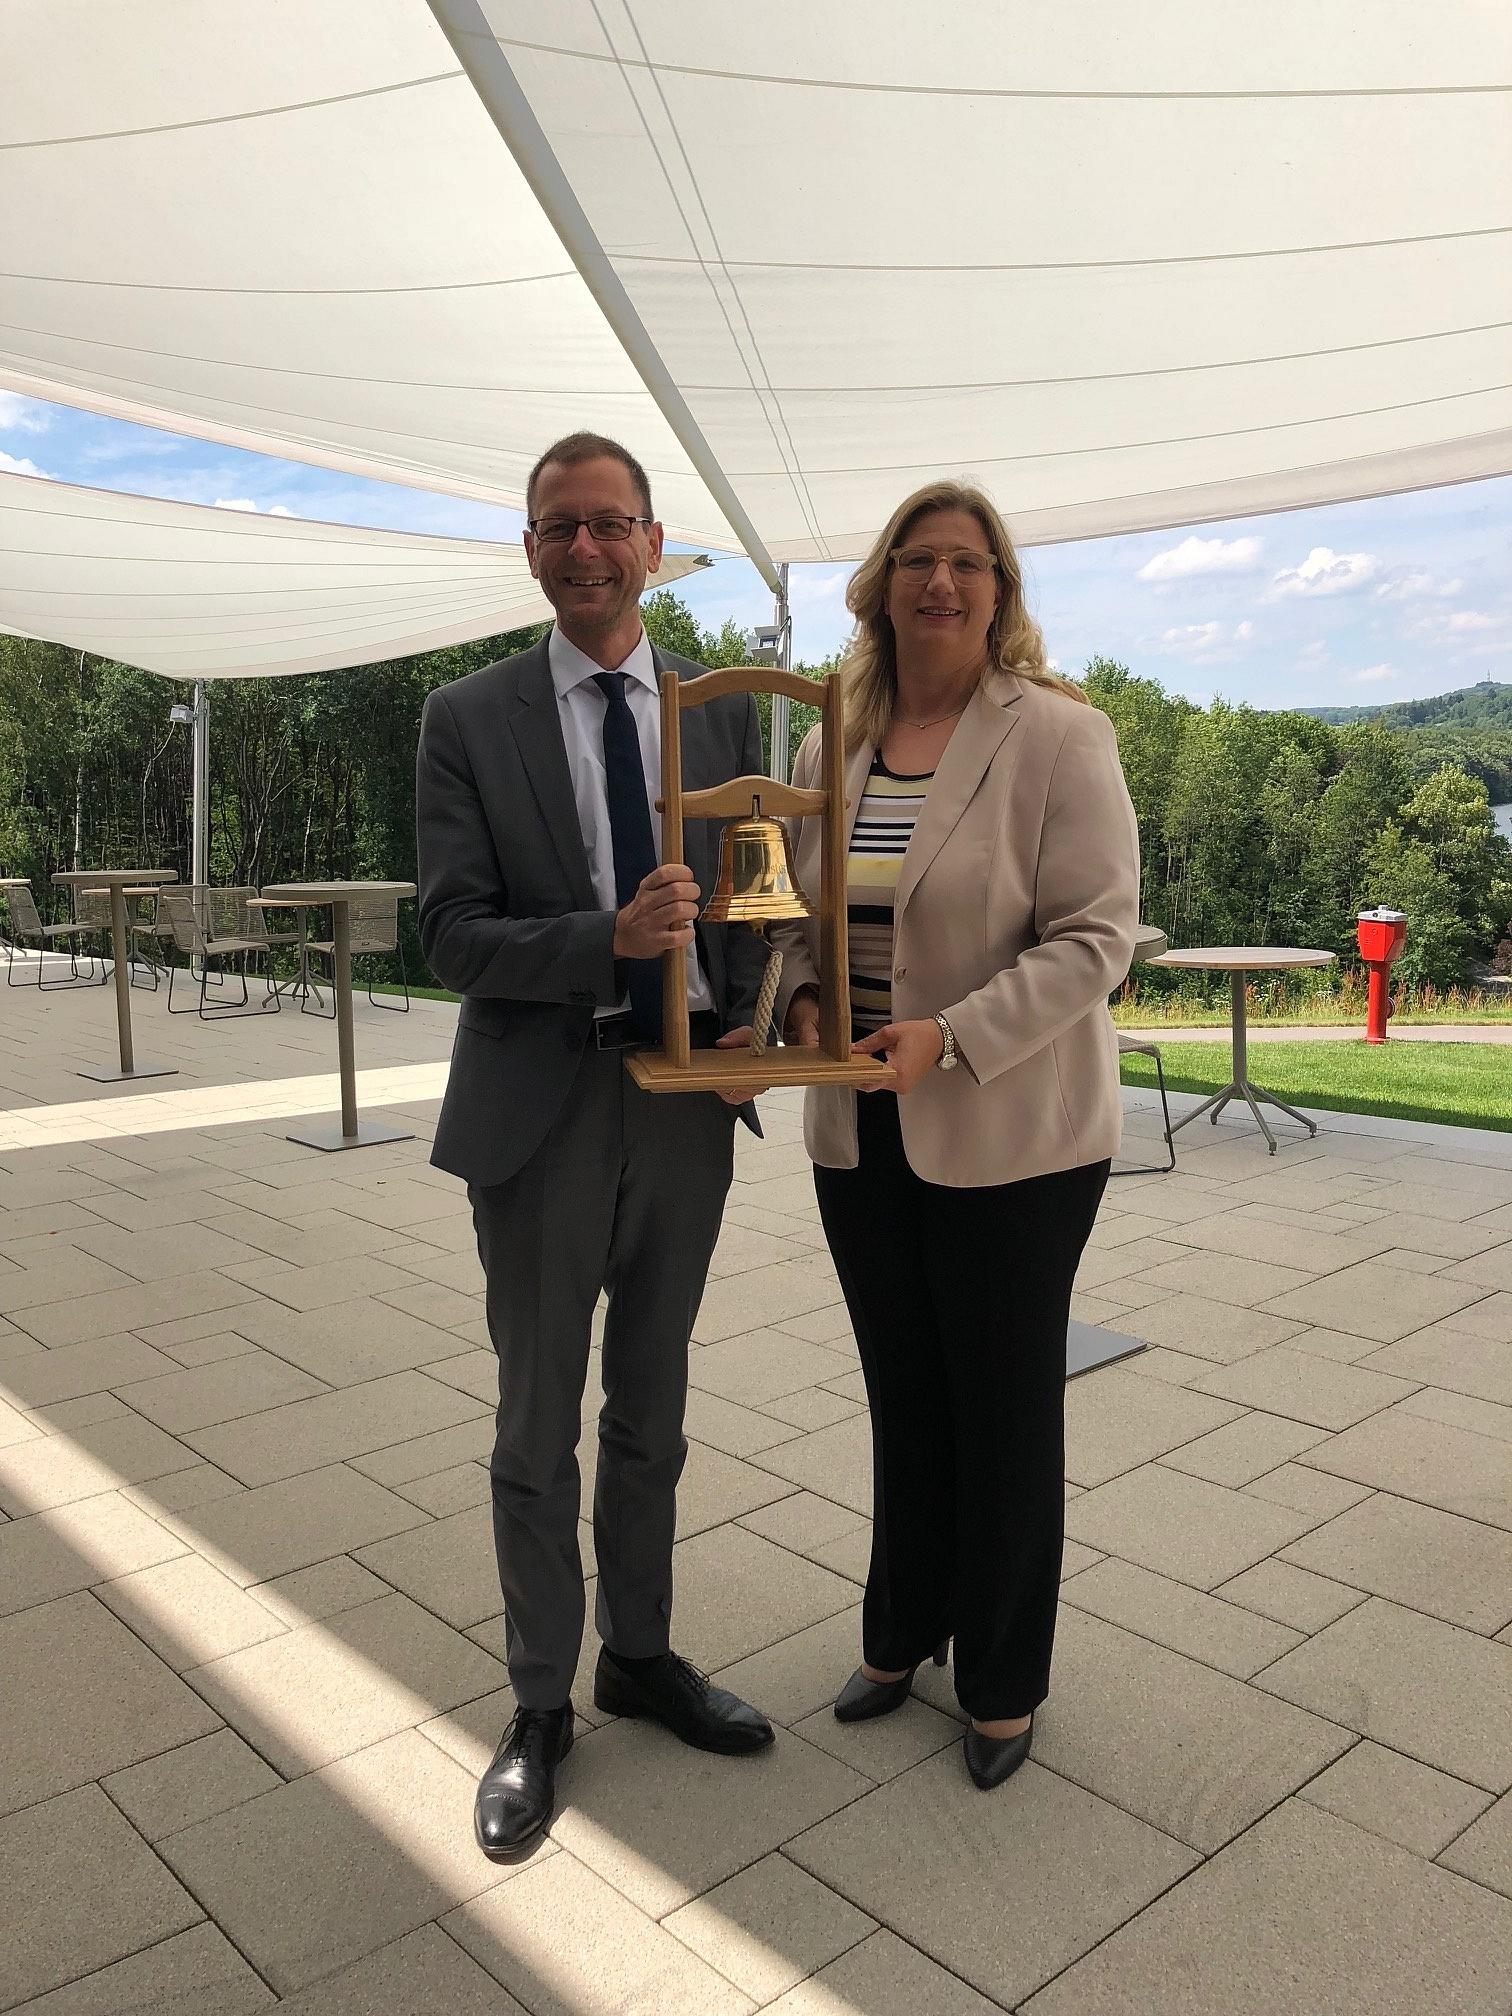 Anke Rehlinger übergibt Senator Martin Günthner eine Glocke